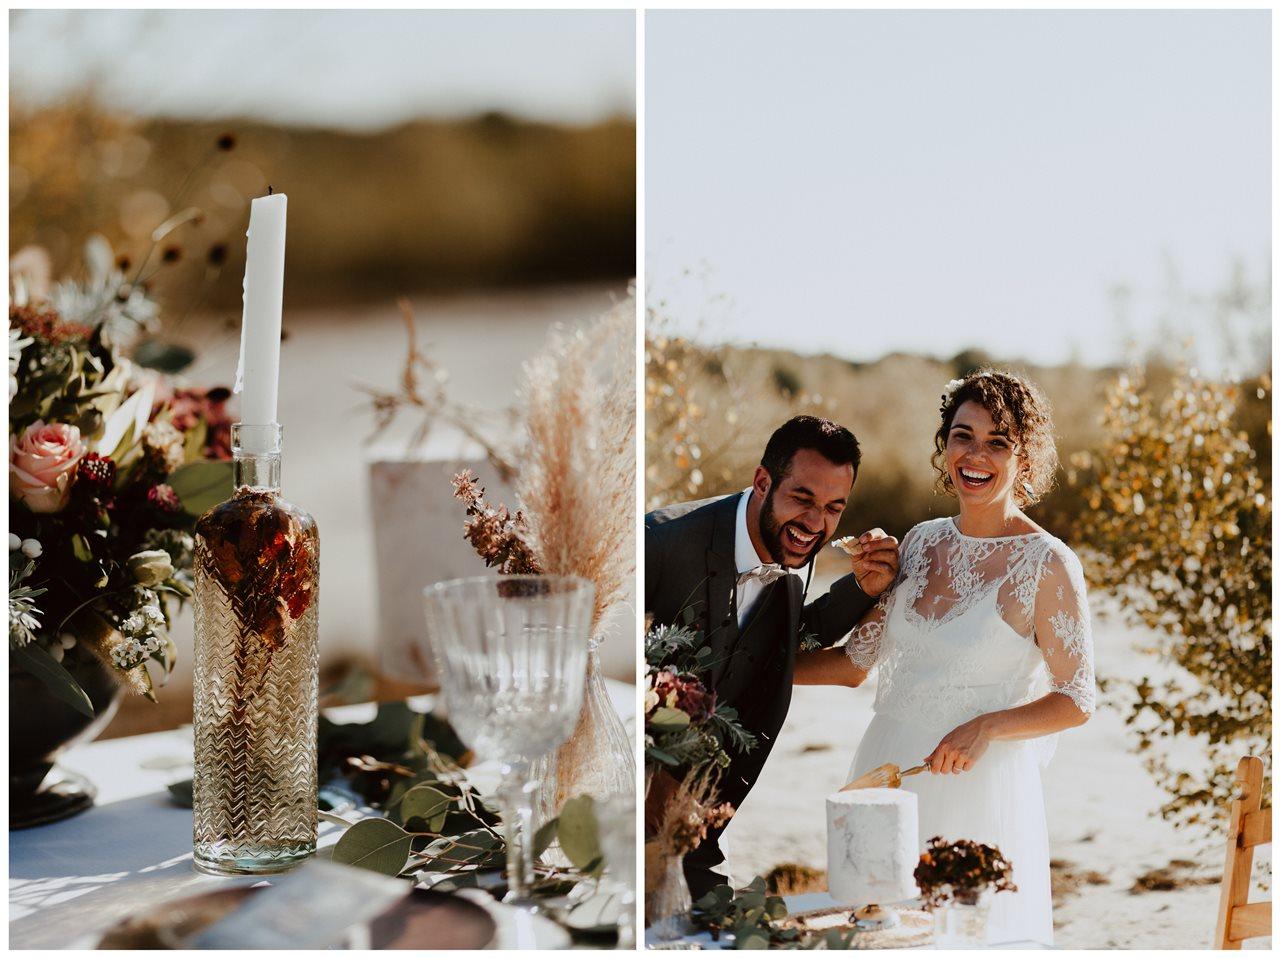 mariage nude plage fleurs mariés rires gâteau Petite Douce